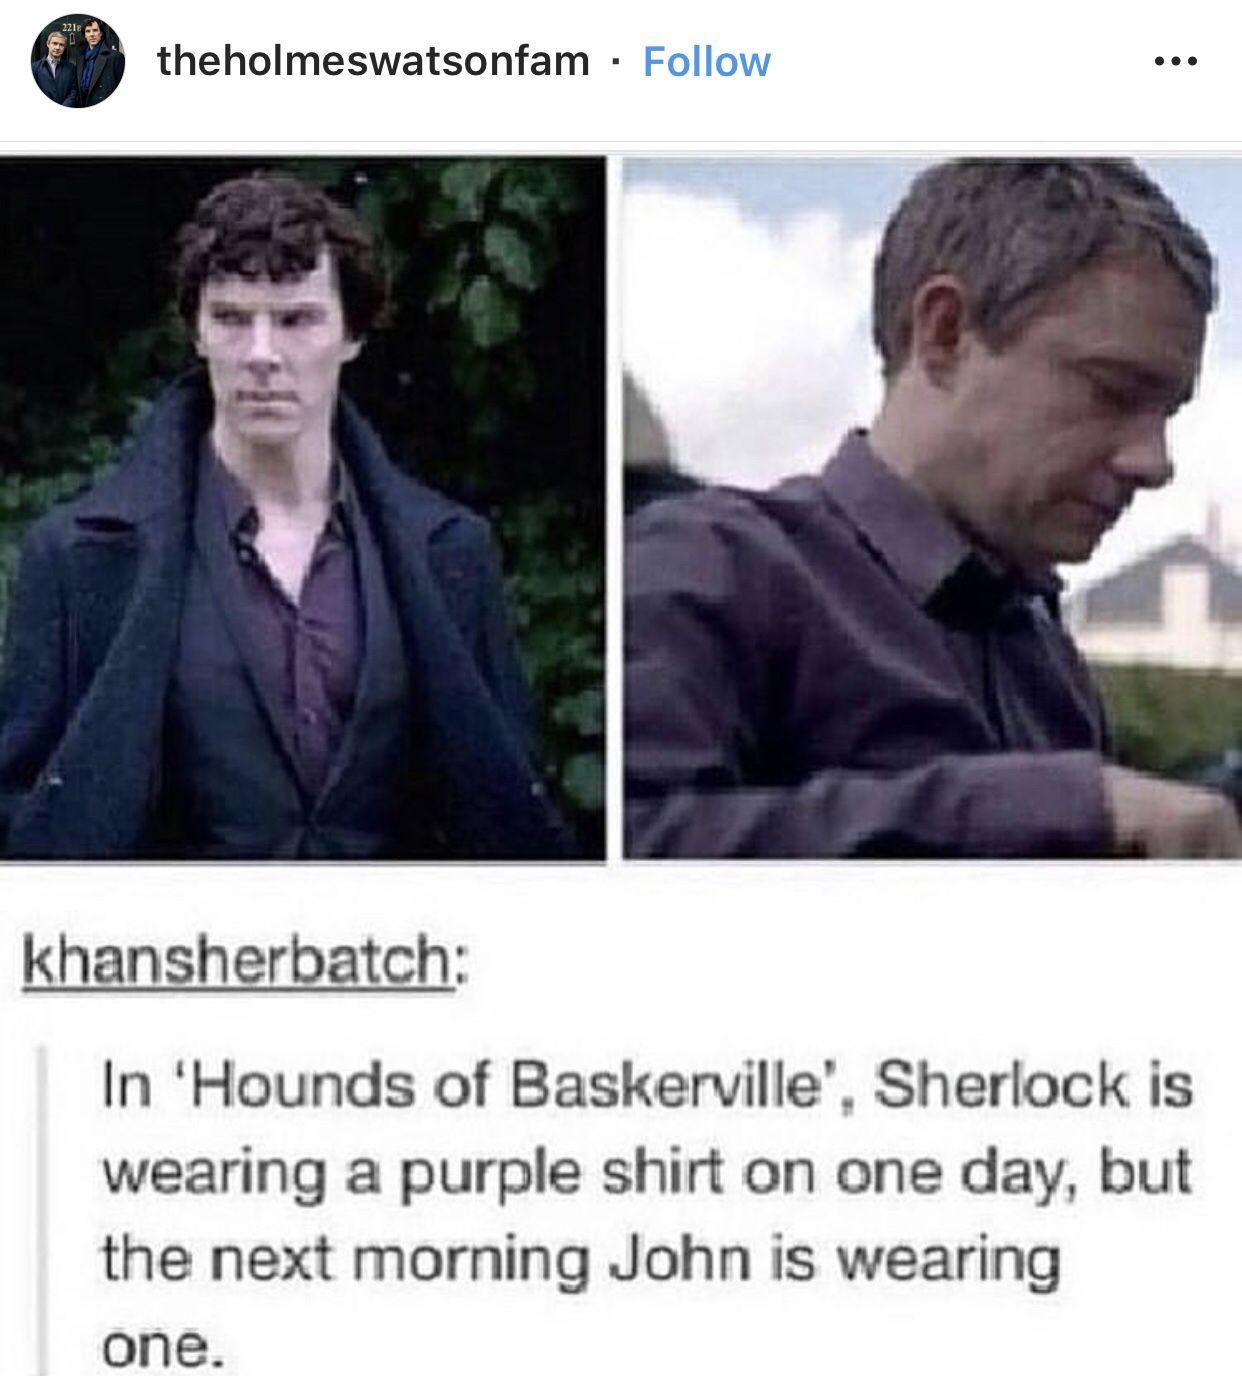 Pin By Firelordzuko On Sherlock Bbc In 2020 Sherlock Funny Sherlock Sherlock Quotes